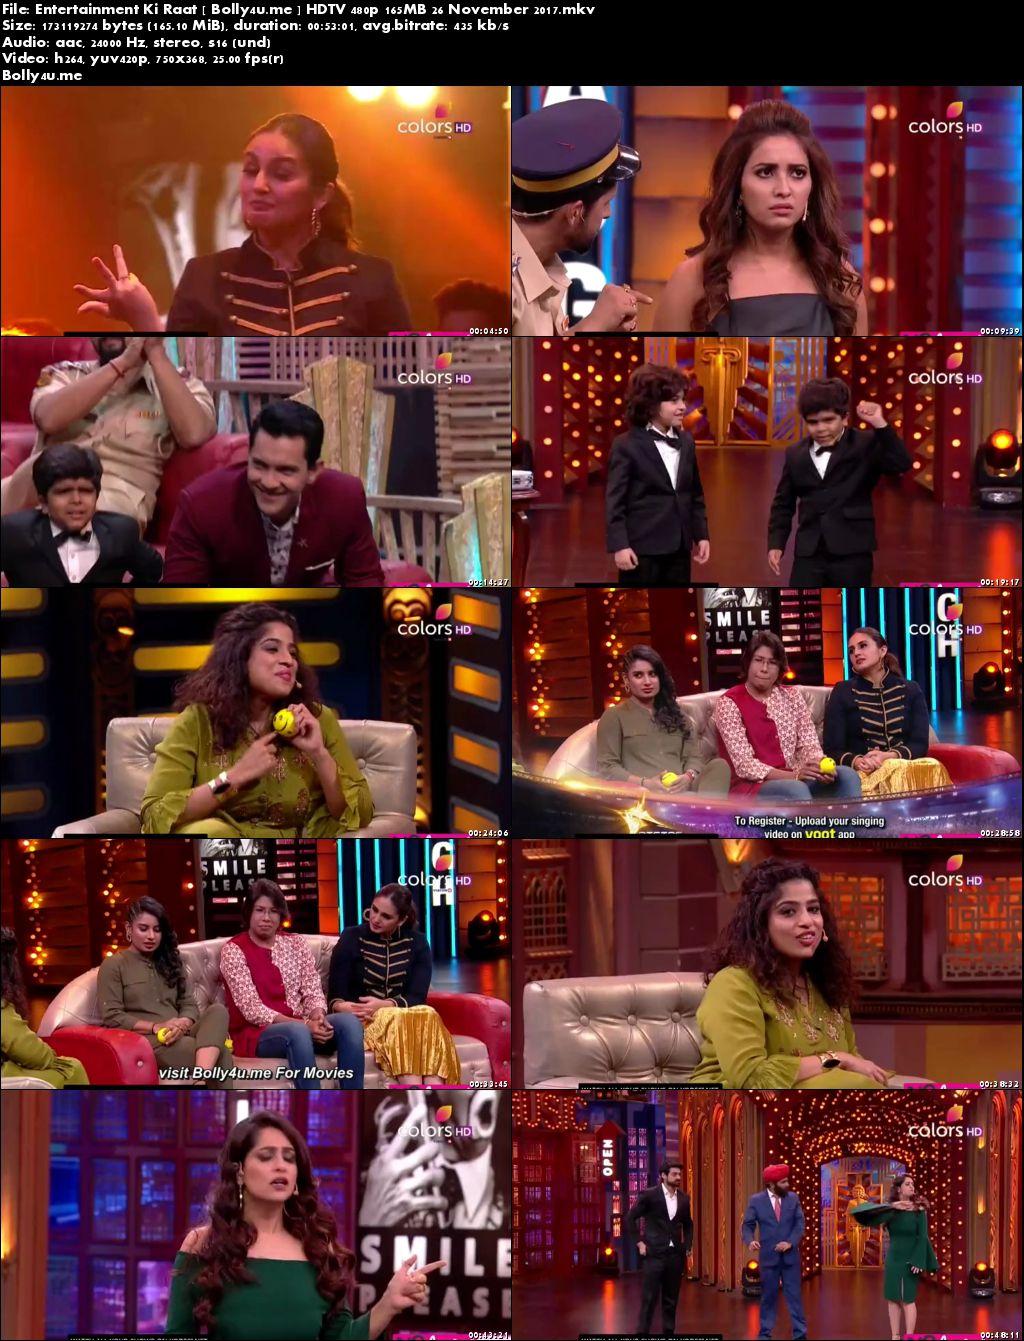 Entertainment Ki Raat HDTV 480p 160MB 26 November 2017 Download